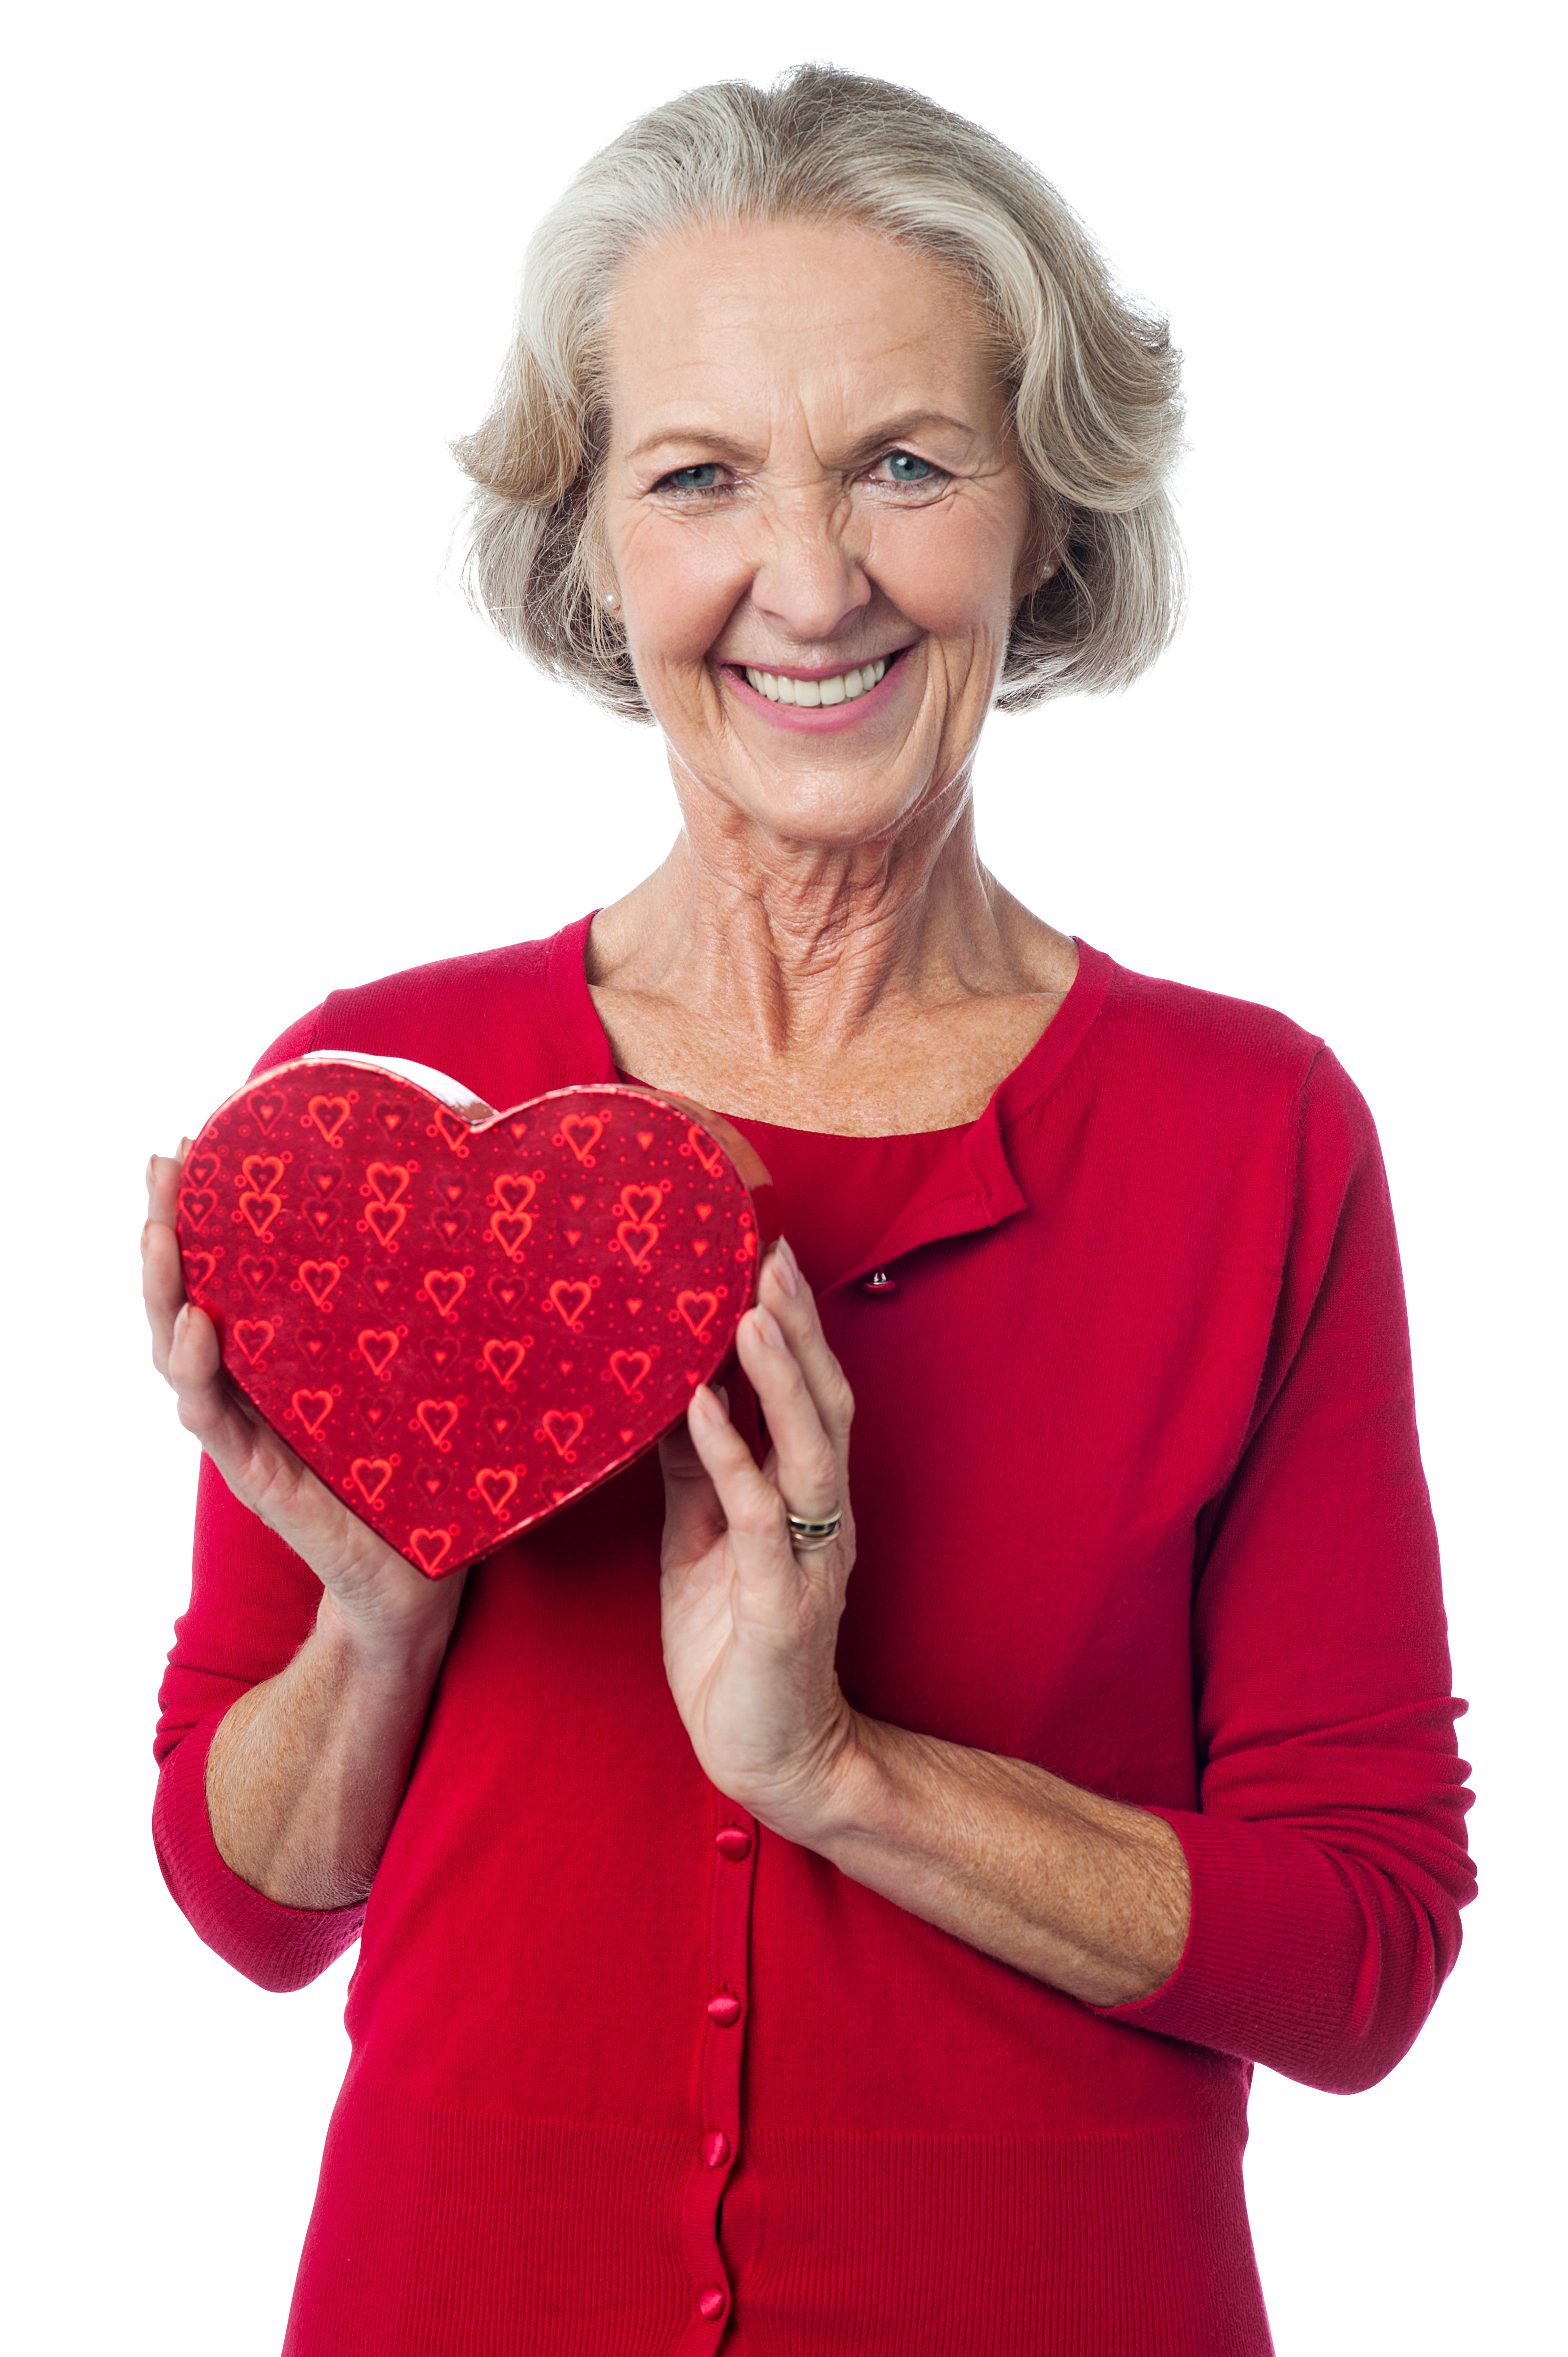 Grandmother PNG Image